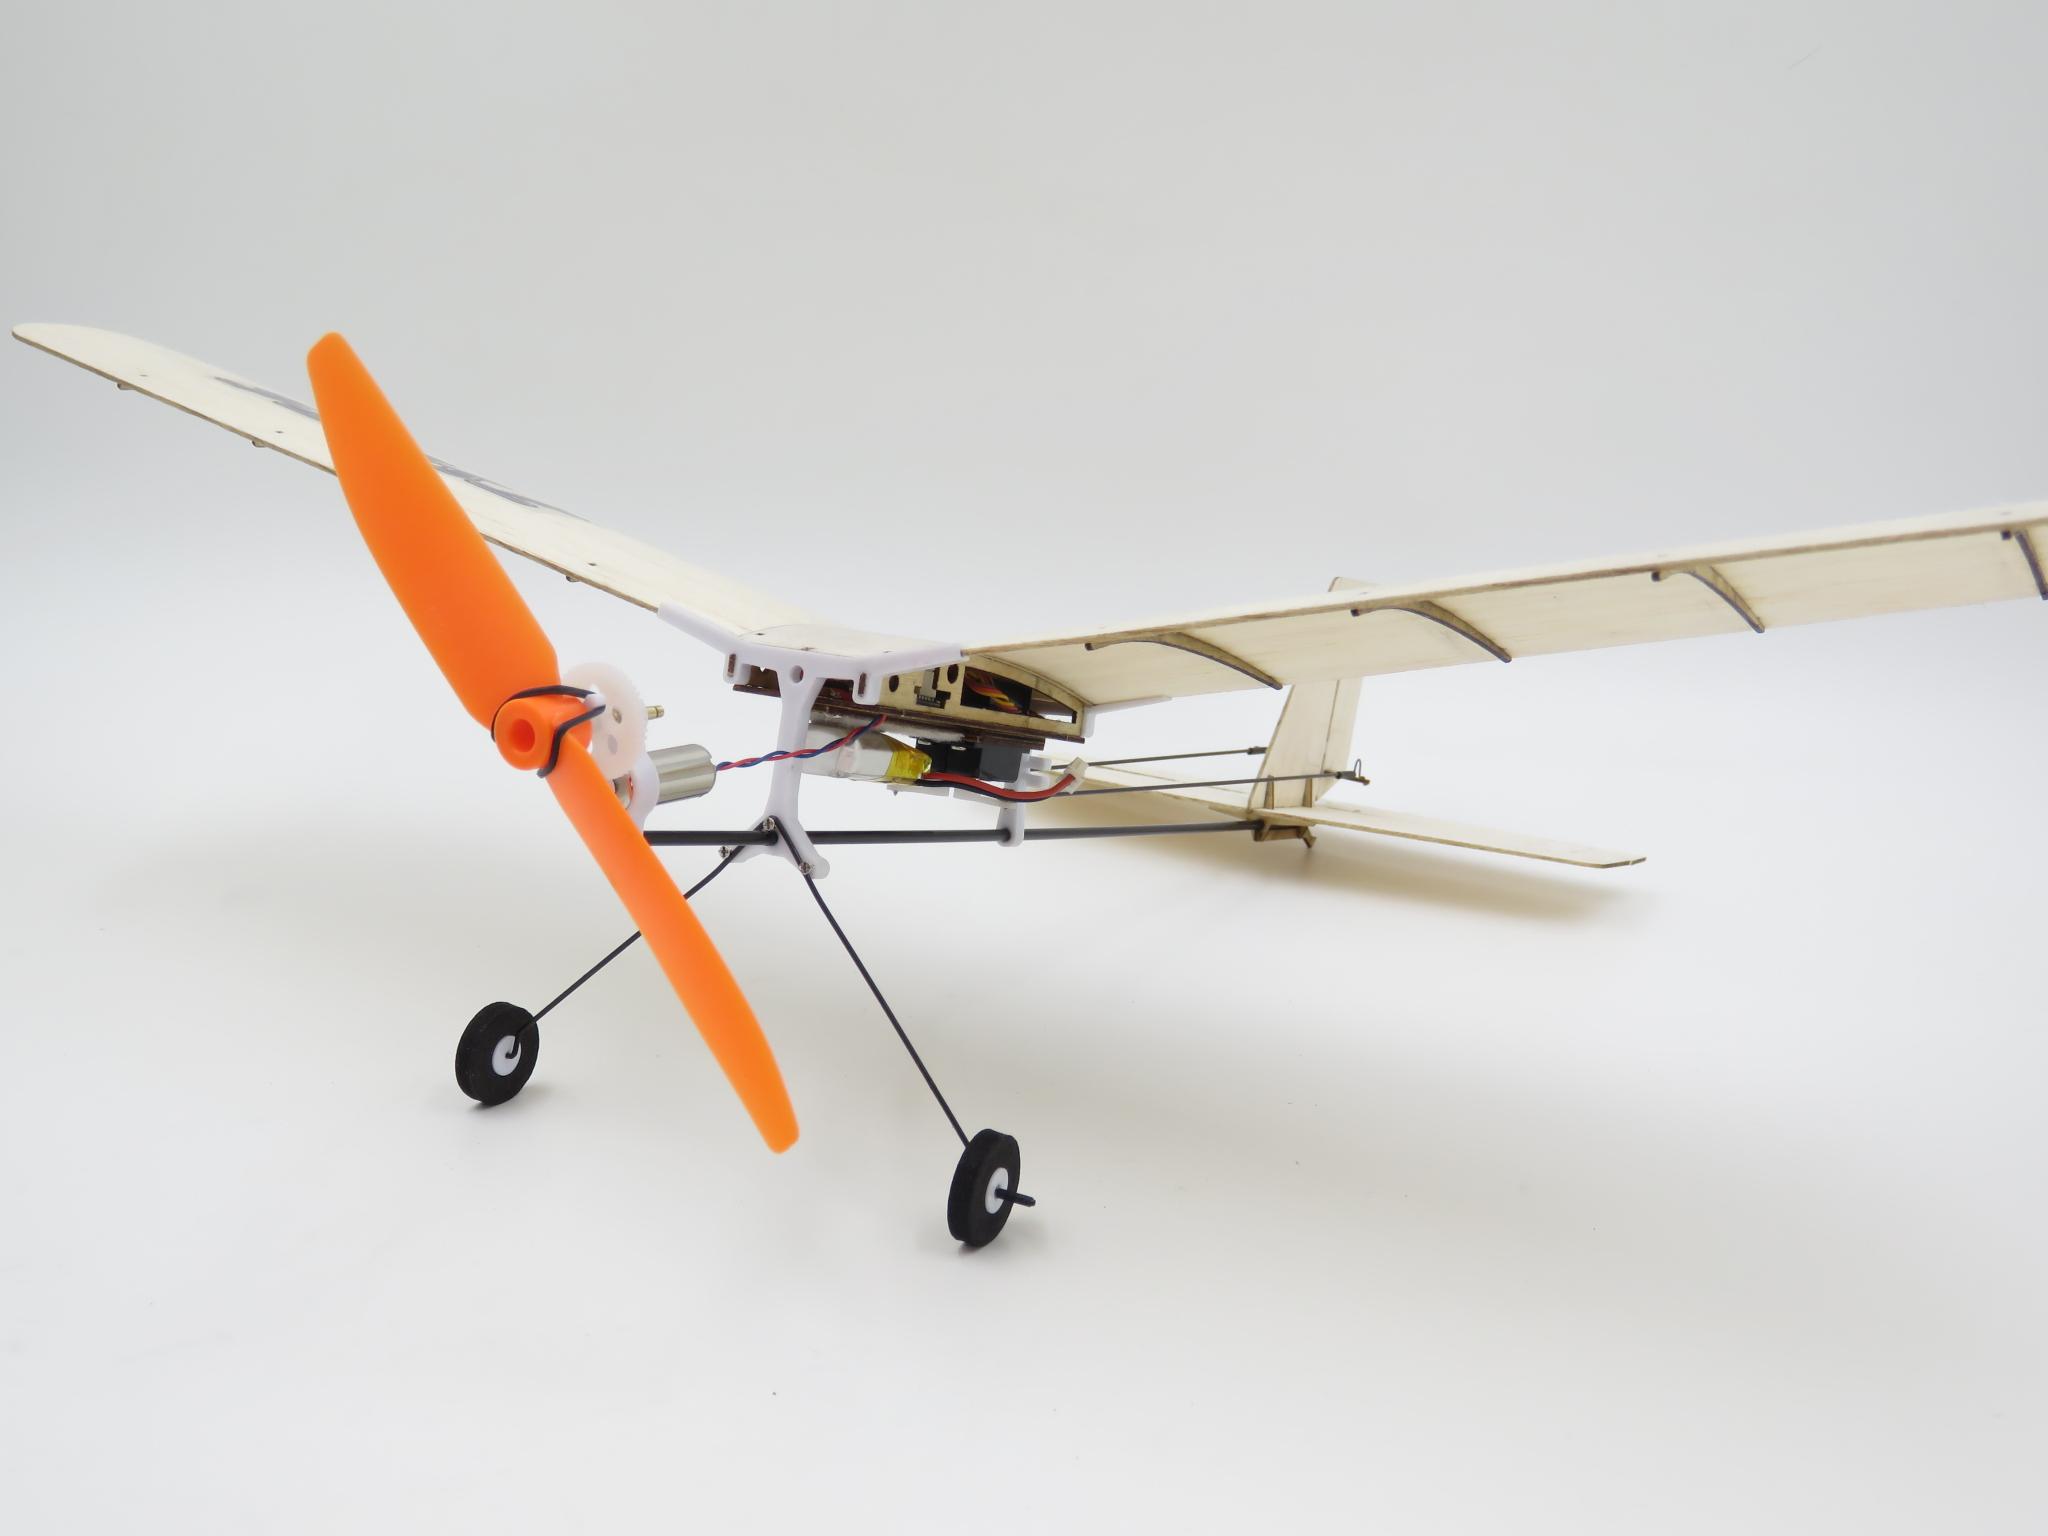 TY Model 3-3 370mm Wingspan Balsa Wood Laser Cut RC Airplane KIT - Photo: 4